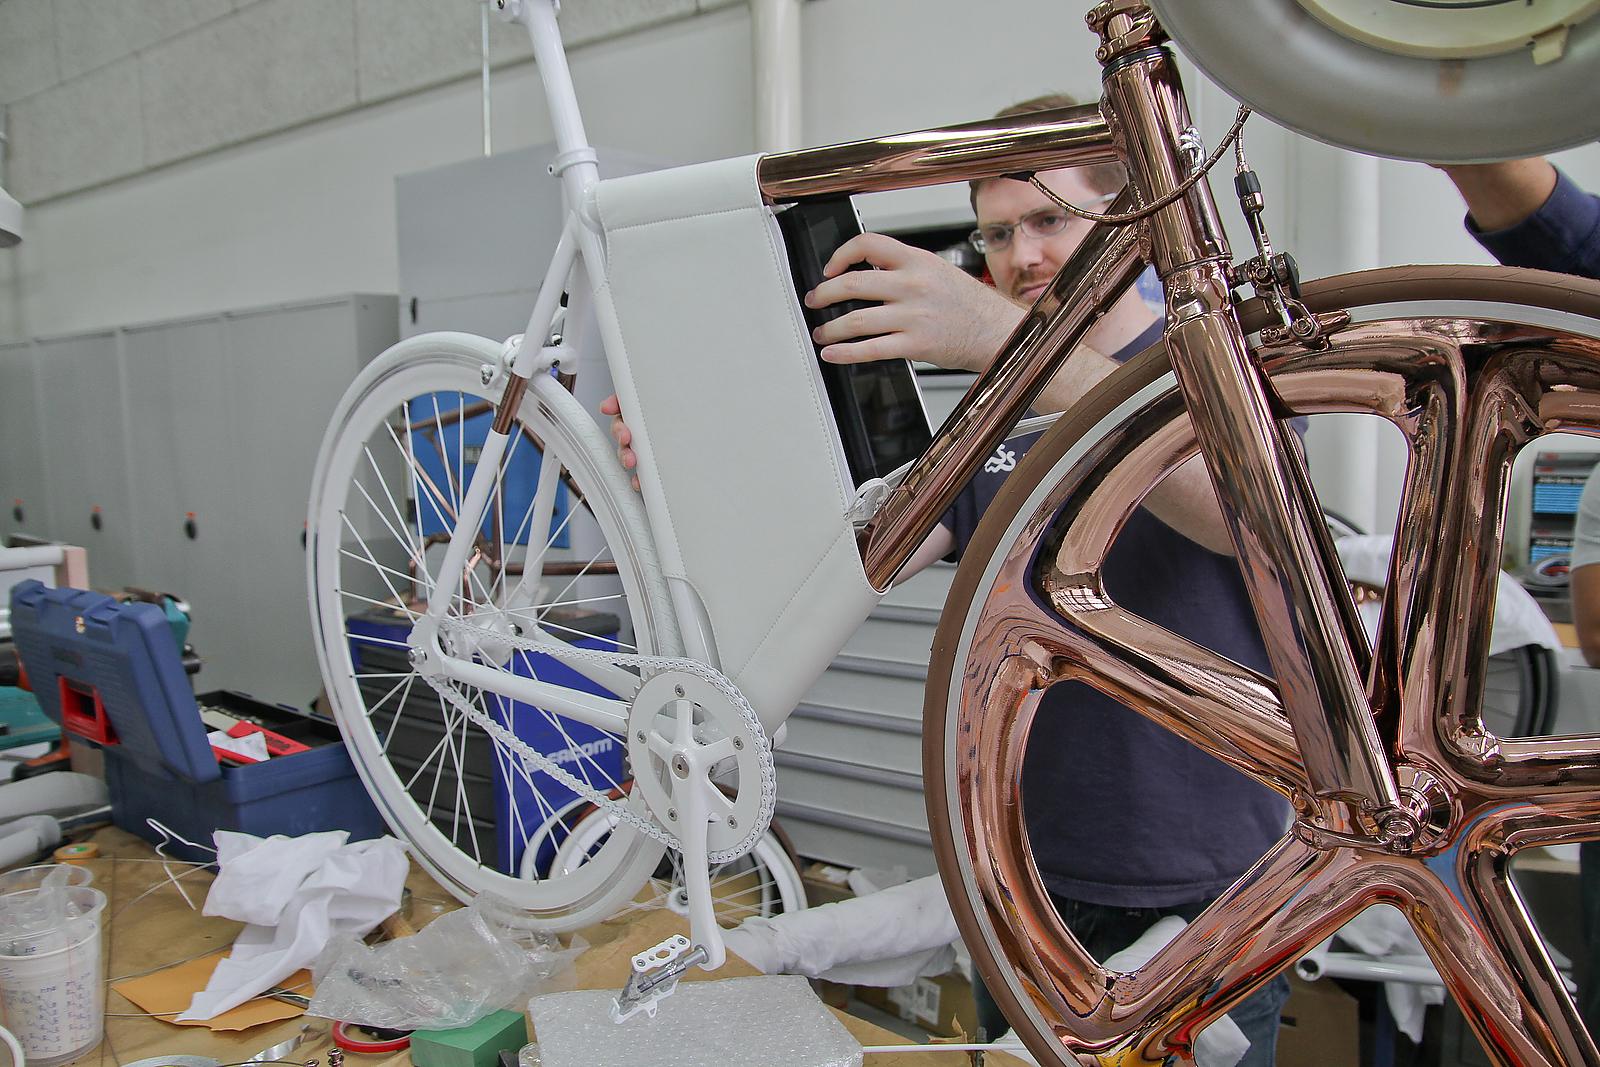 DL121 Bike by Peugeot Design Laboratory.